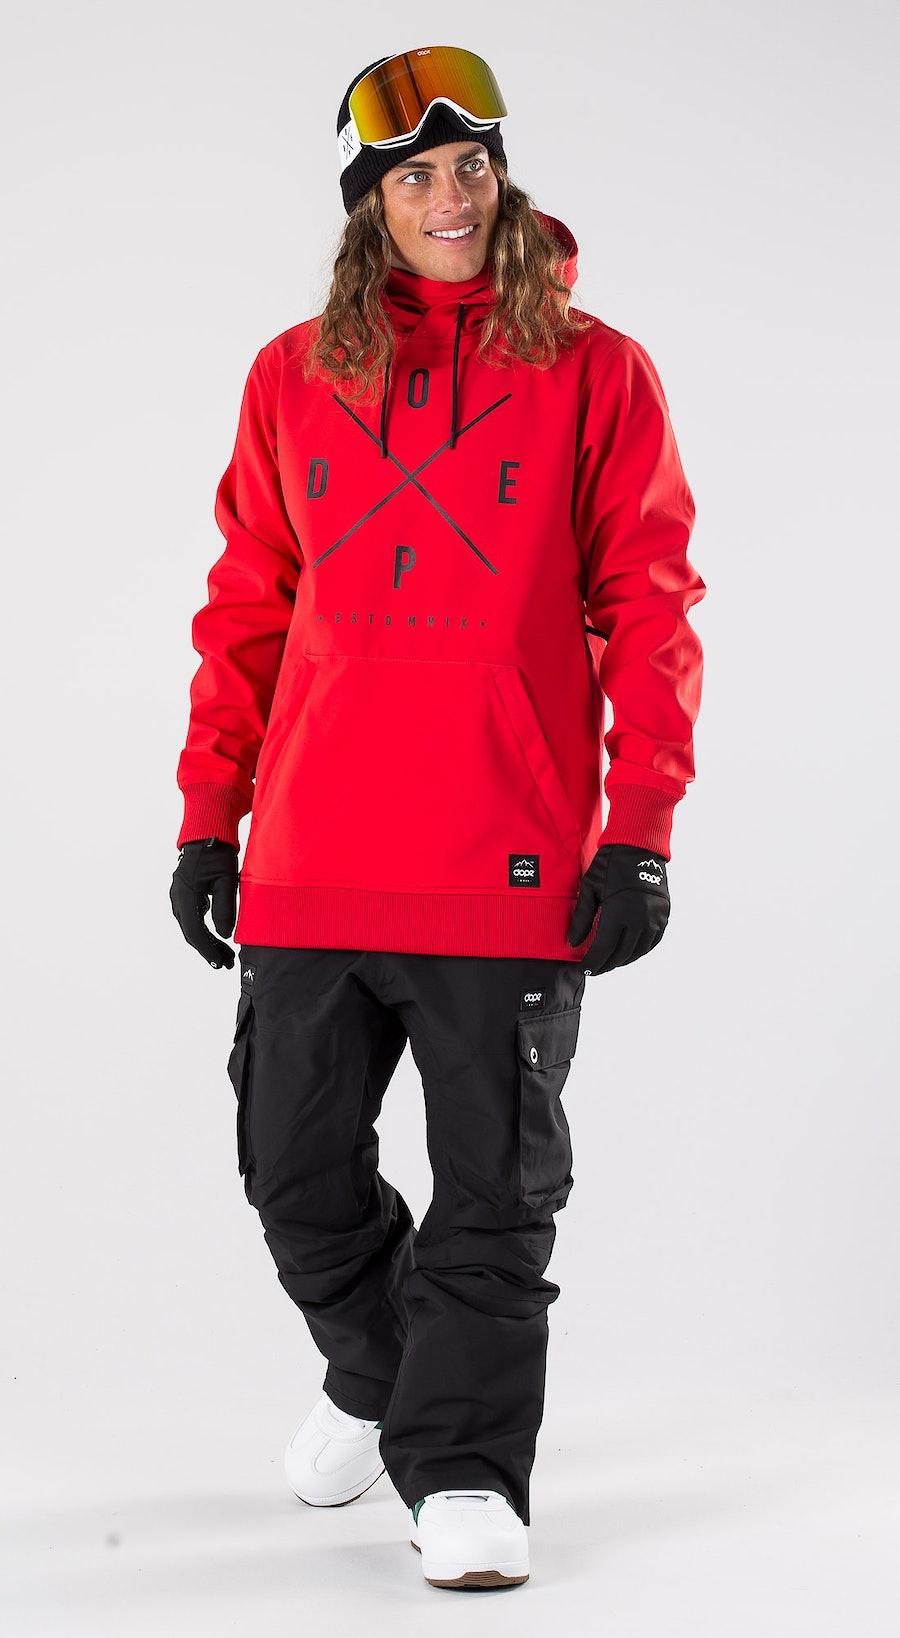 Dope Yeti Red Snowboardkläder Multi